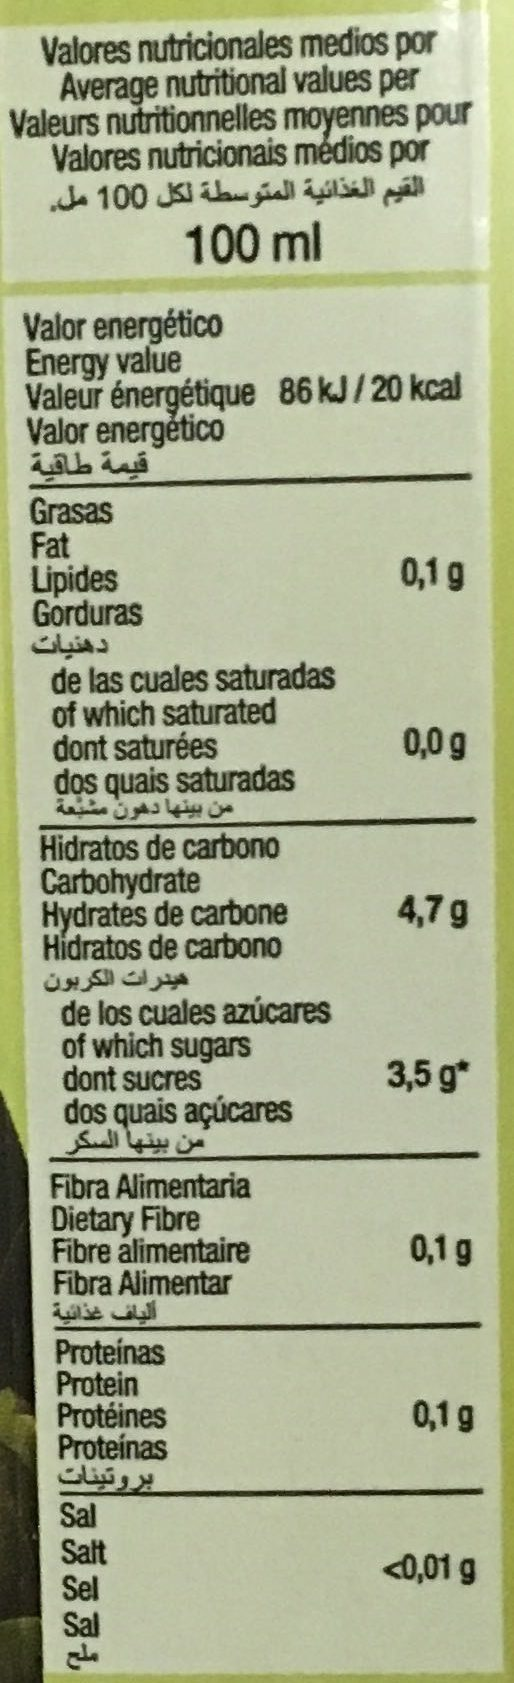 Exótico néctar de piña y coco sin azúcares añadidos - Informació nutricional - fr